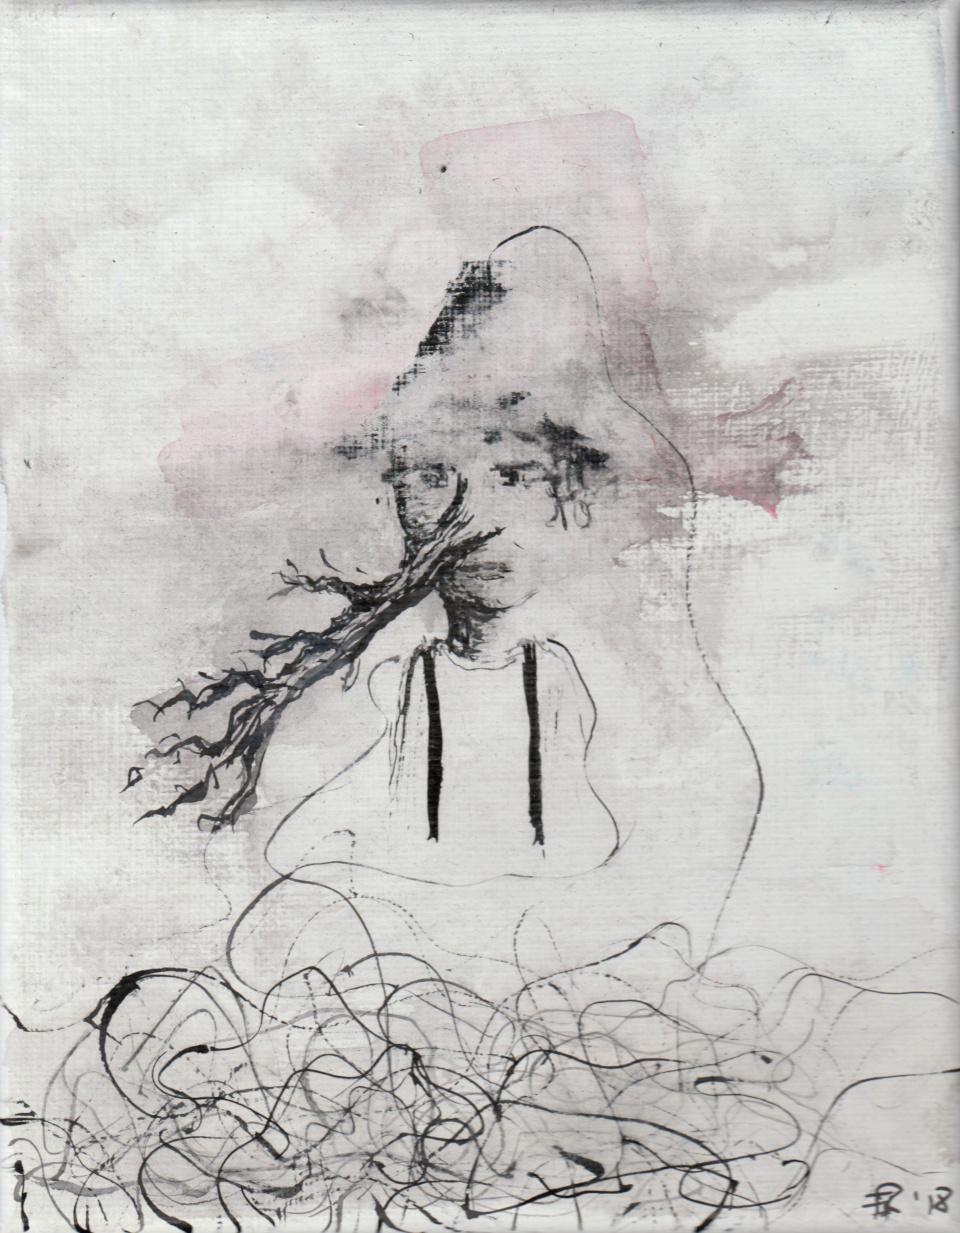 Florencia Lastreto - Studies of Pinocchio